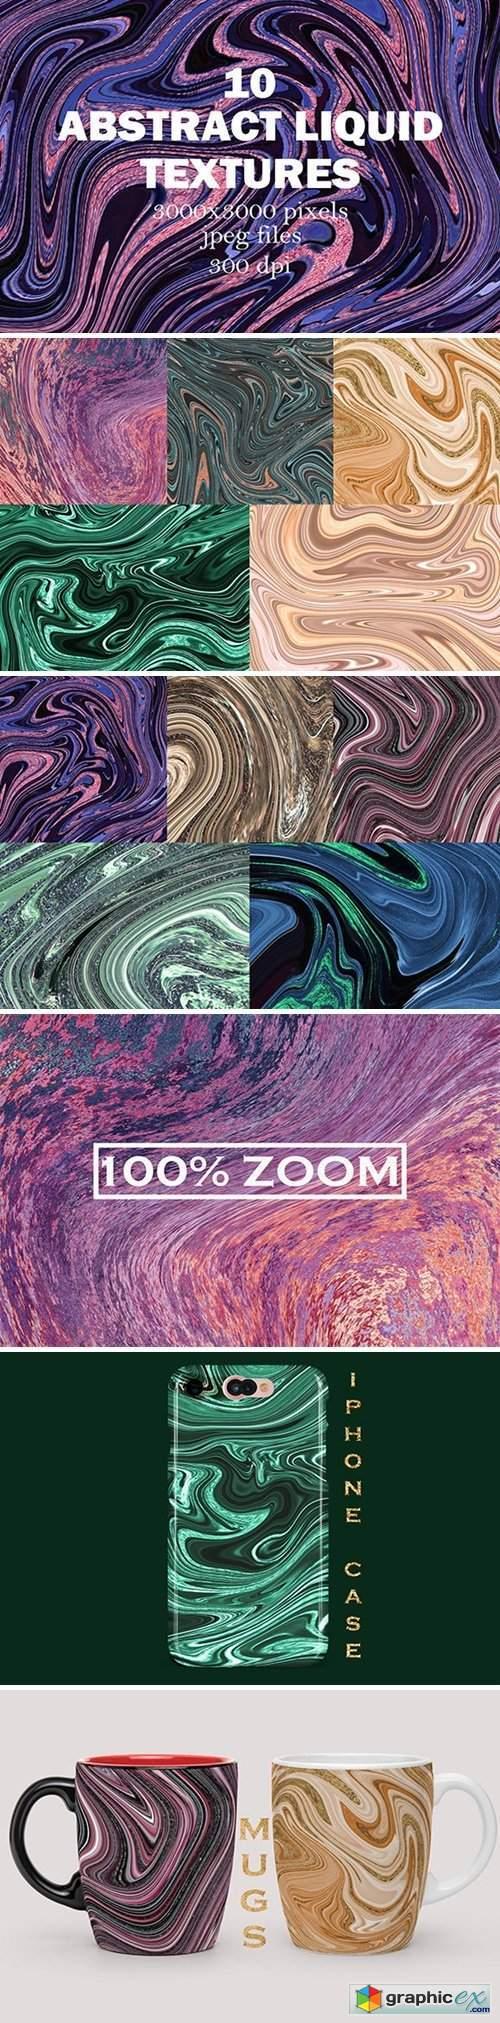 10 Abstract Liquid Textures